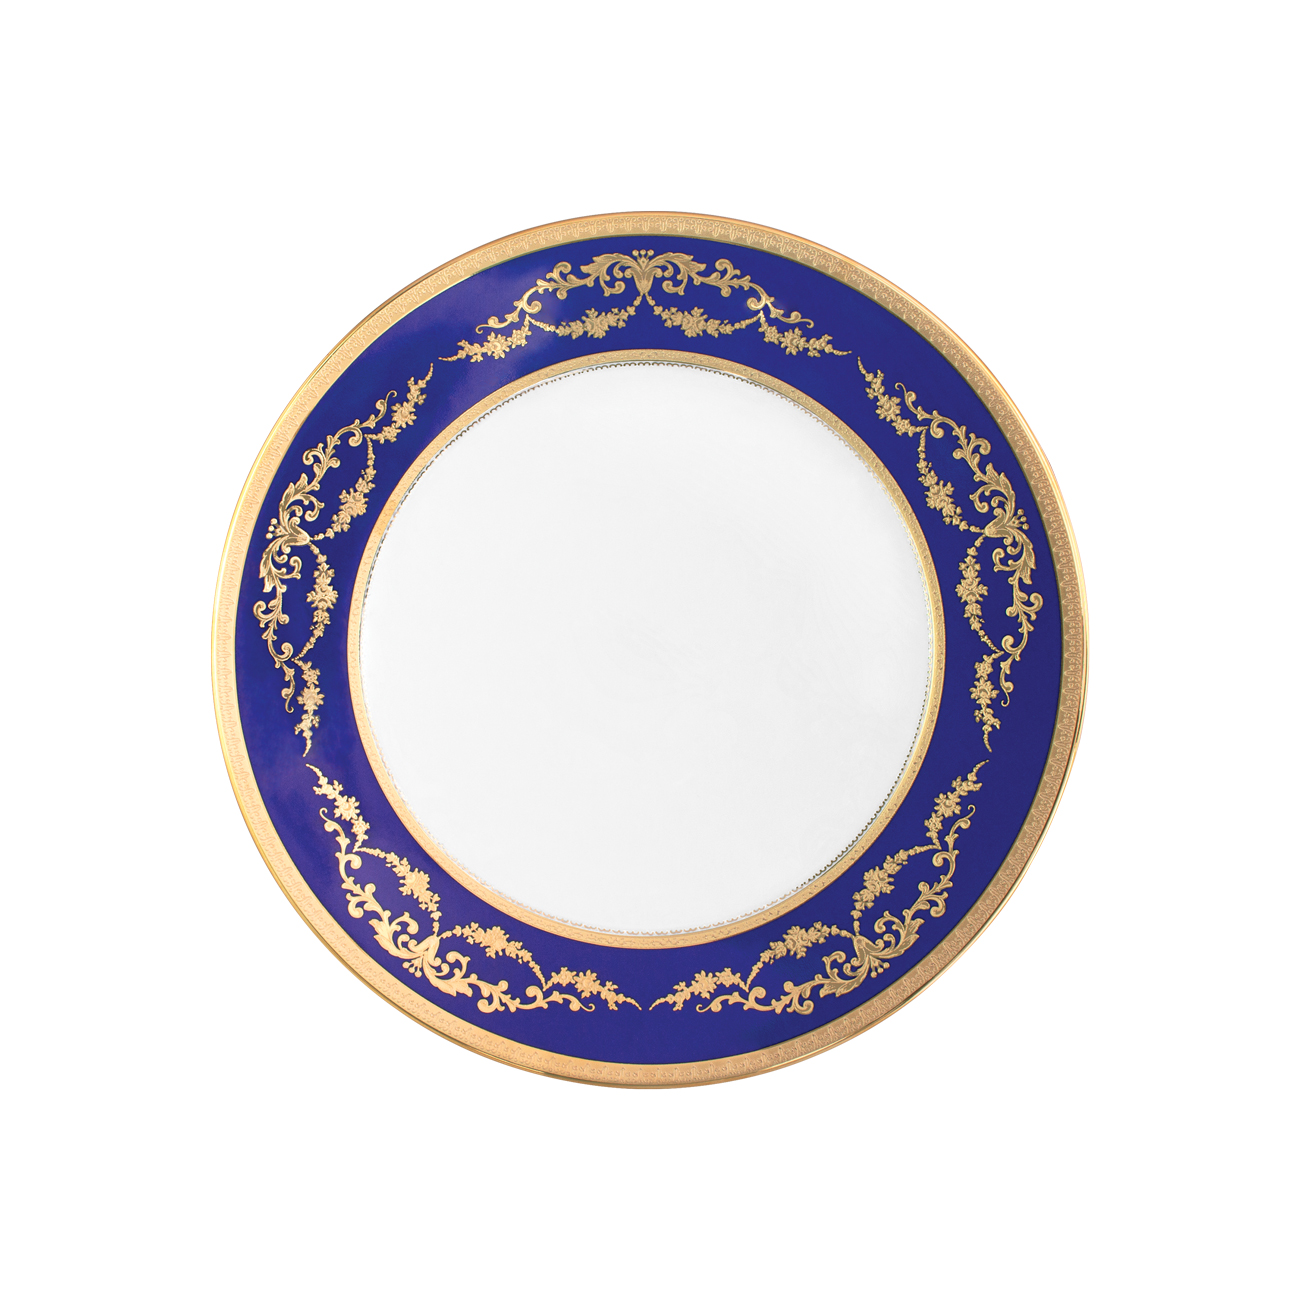 Dinner Plate 27cm Pétala Simples 0